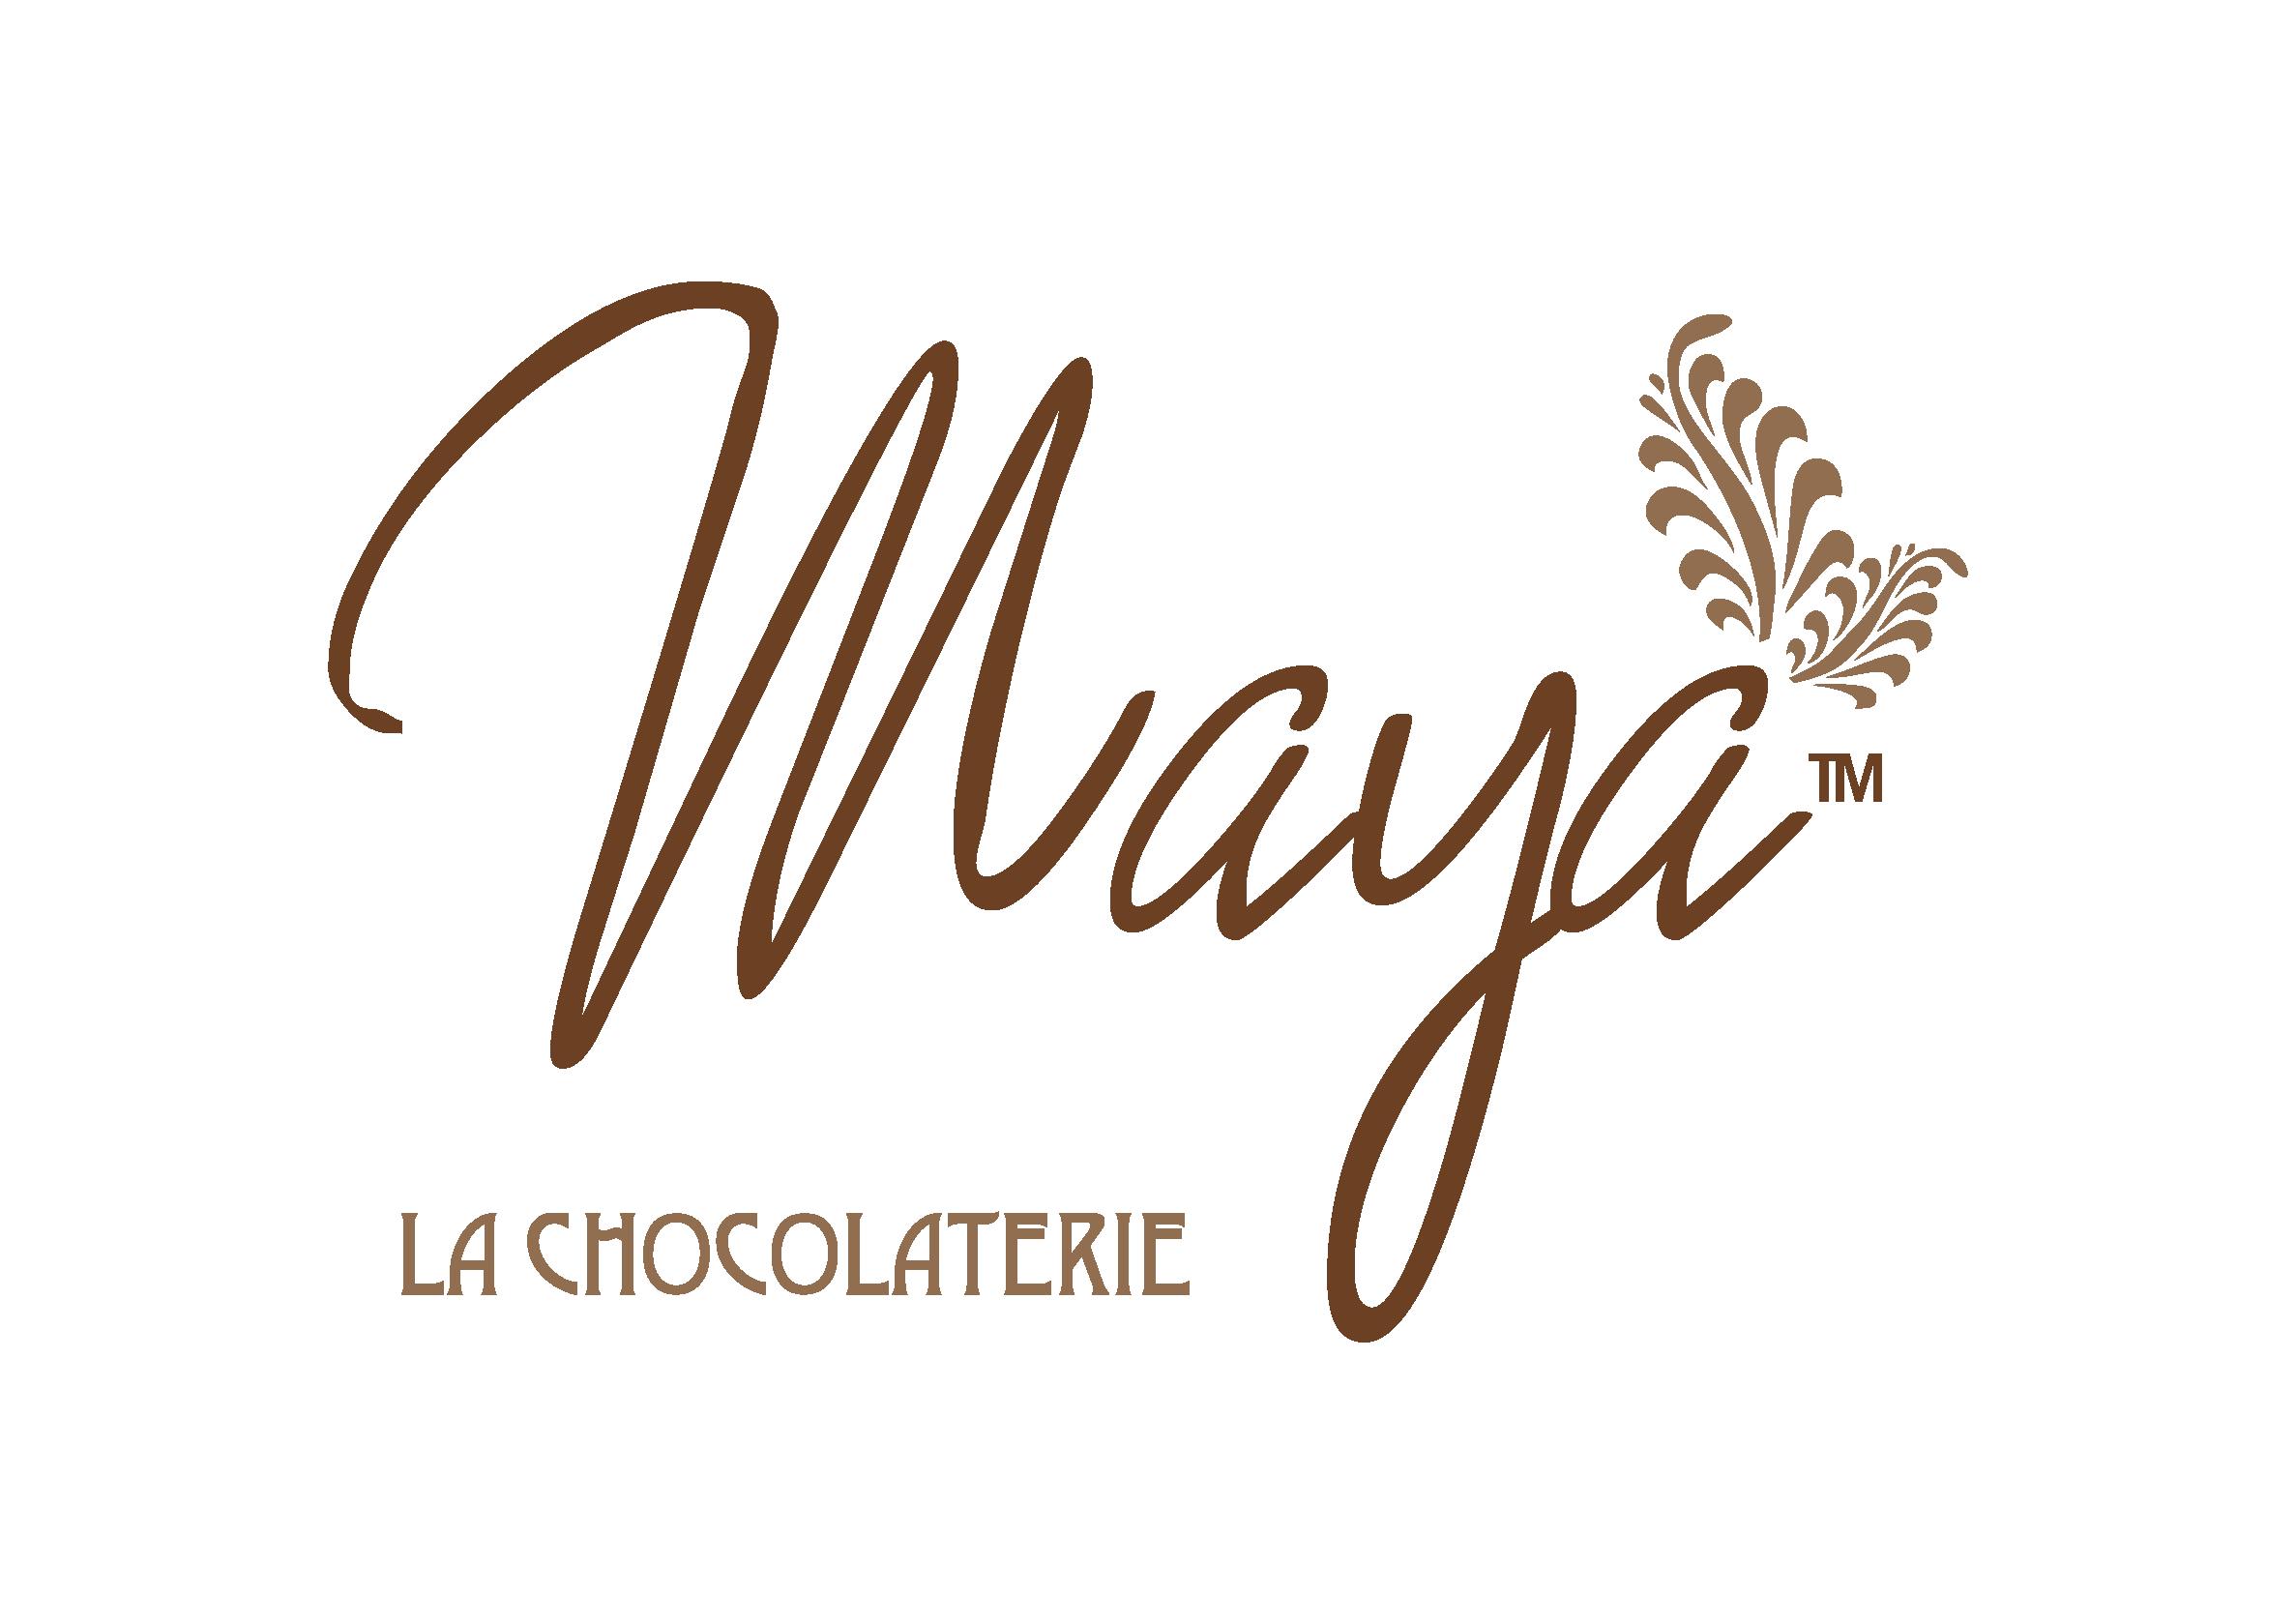 5ea3f7d2e5a1 Enjoy 10% discount when using your Ithmaar Bank Credit and Debit Cards at  Maya La Chocolatier.